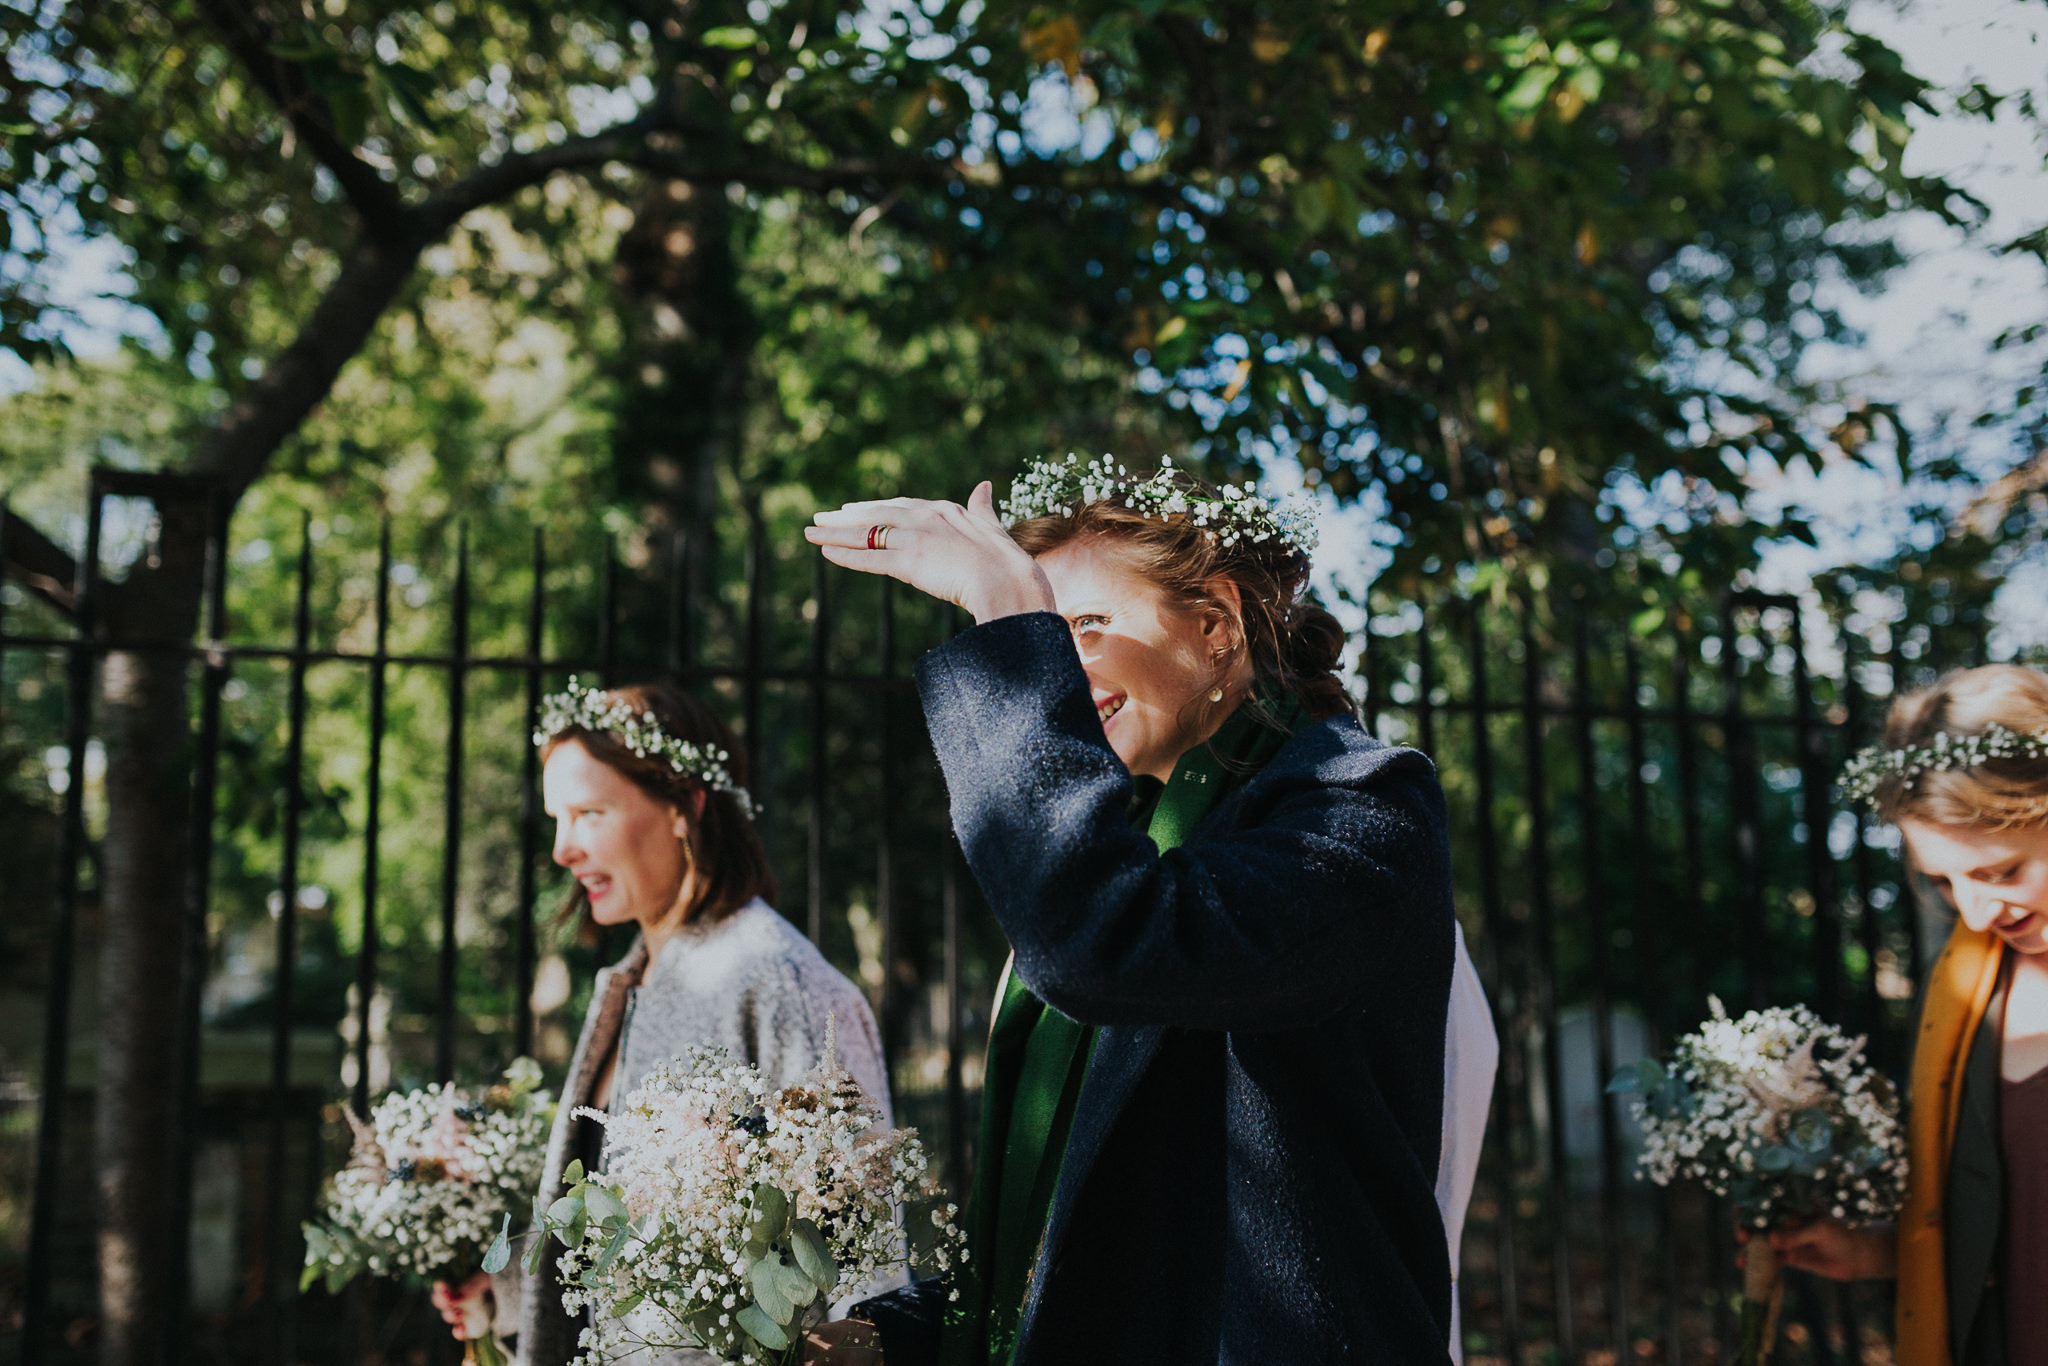 kate-gray-london-wedding-photography-16.jpg